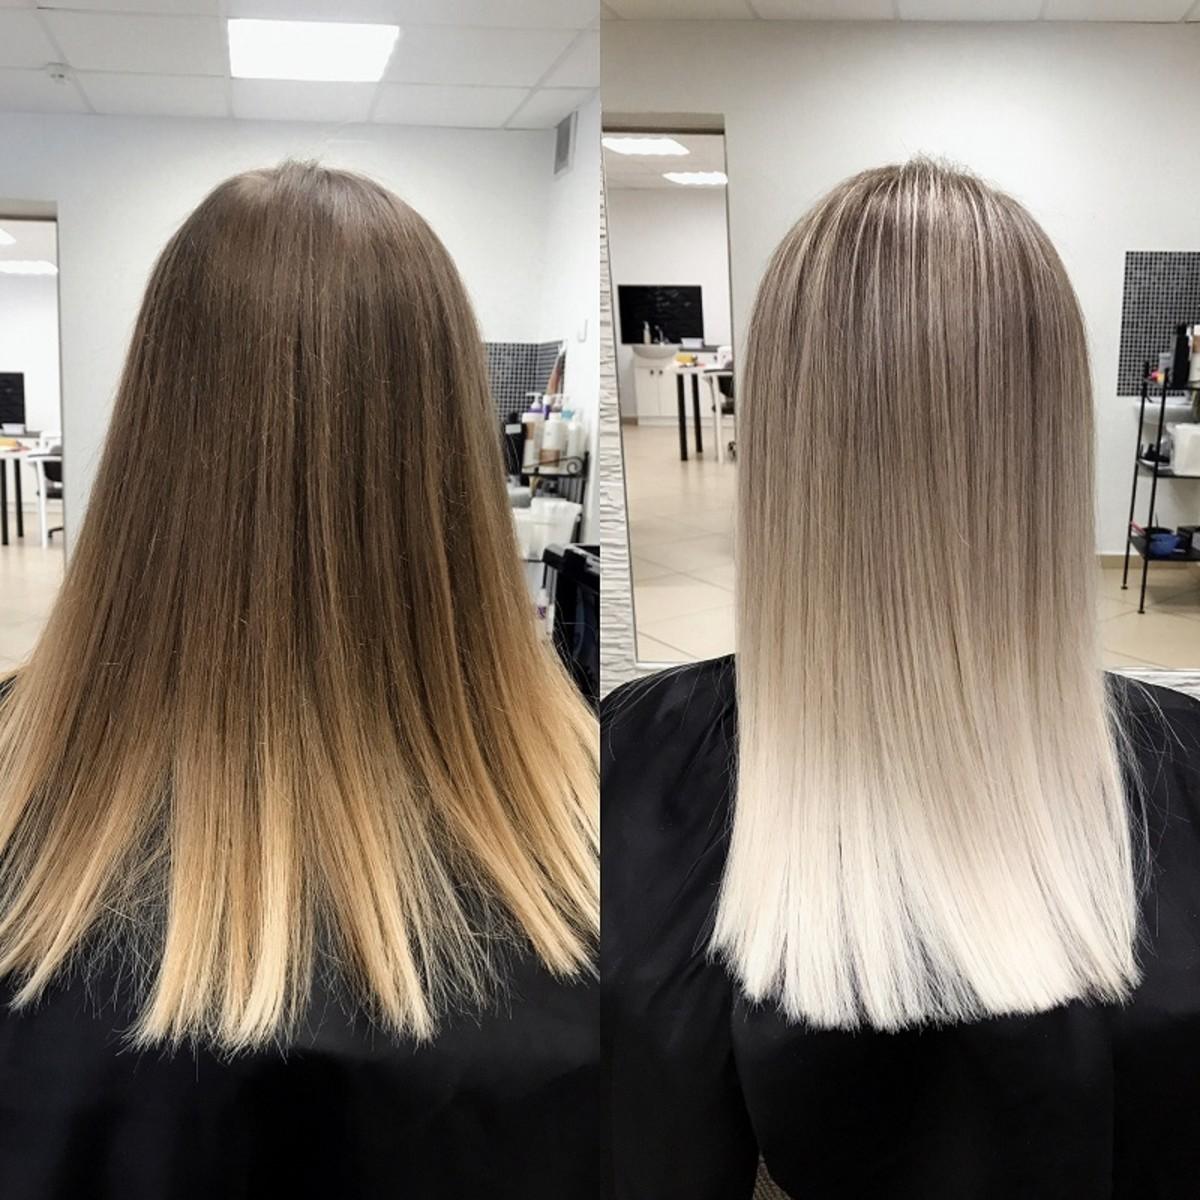 Toning transforms dull, brassy hair into a reflective, beautiful shade.